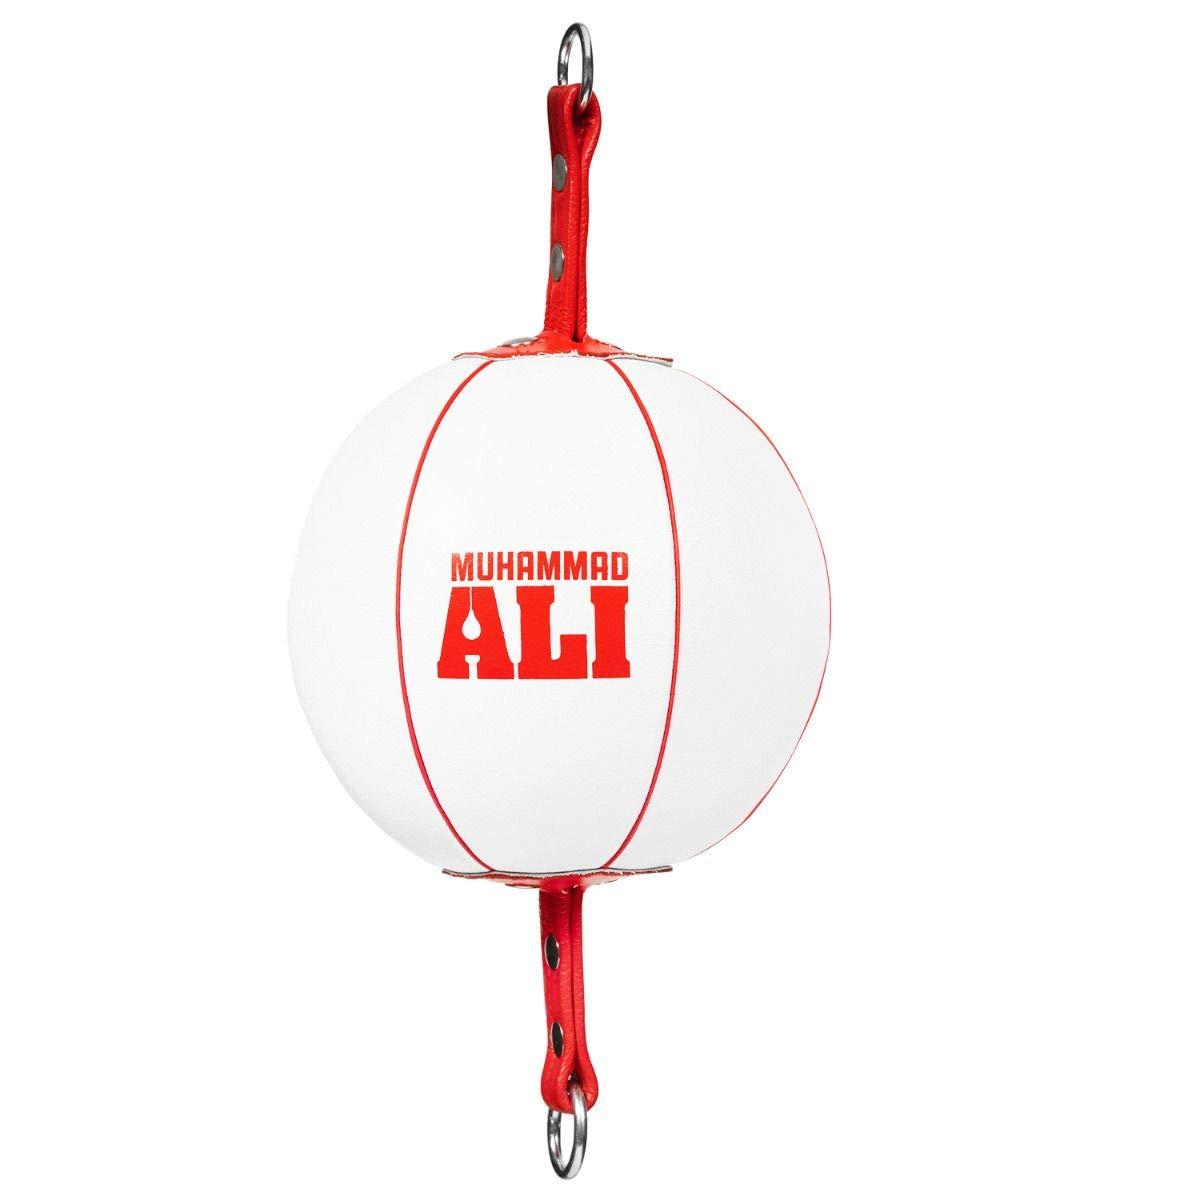 Title ALI Boxing ALI スティングダブルエンドバッグ B07QF4YJQN 7\ 7\ ホワイト/レッド B07QF4YJQN, コホクチョウ:f73d1d3d --- capela.dominiotemporario.com